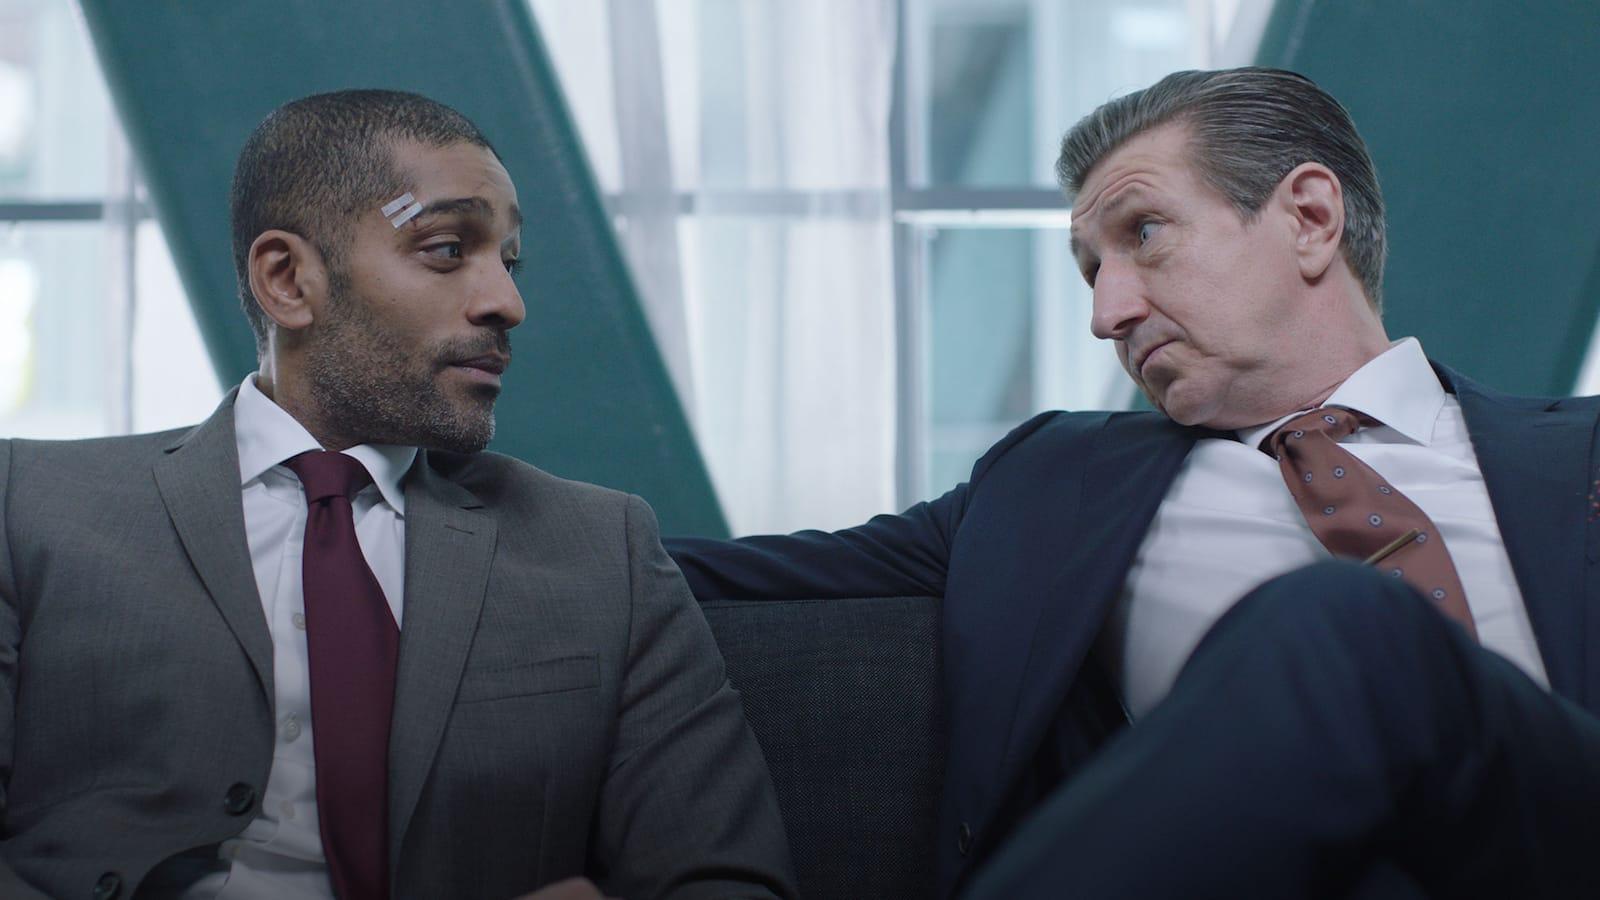 advokaten/season-1/episode-2